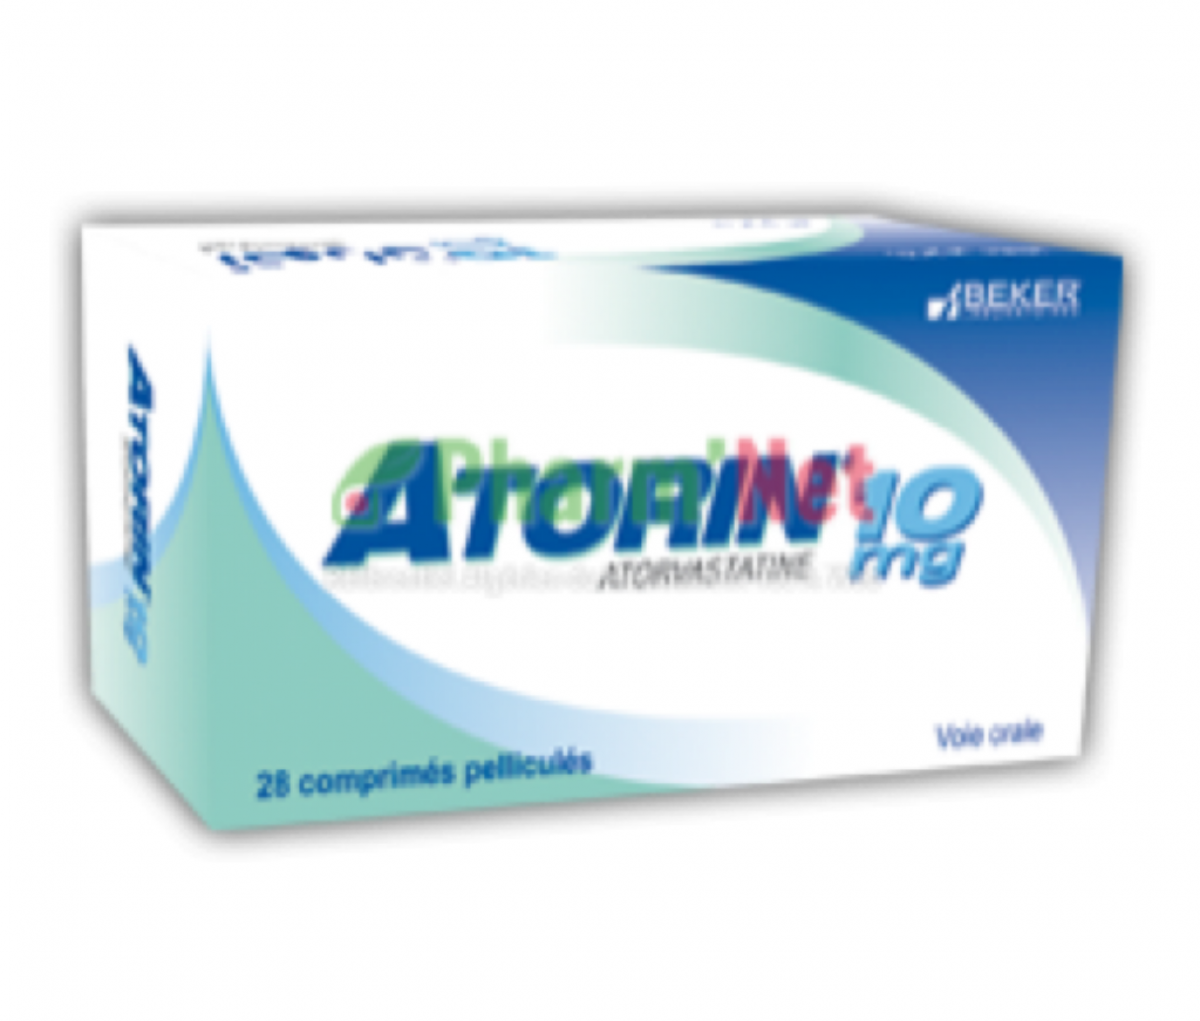 Atorin 10mg Tablet